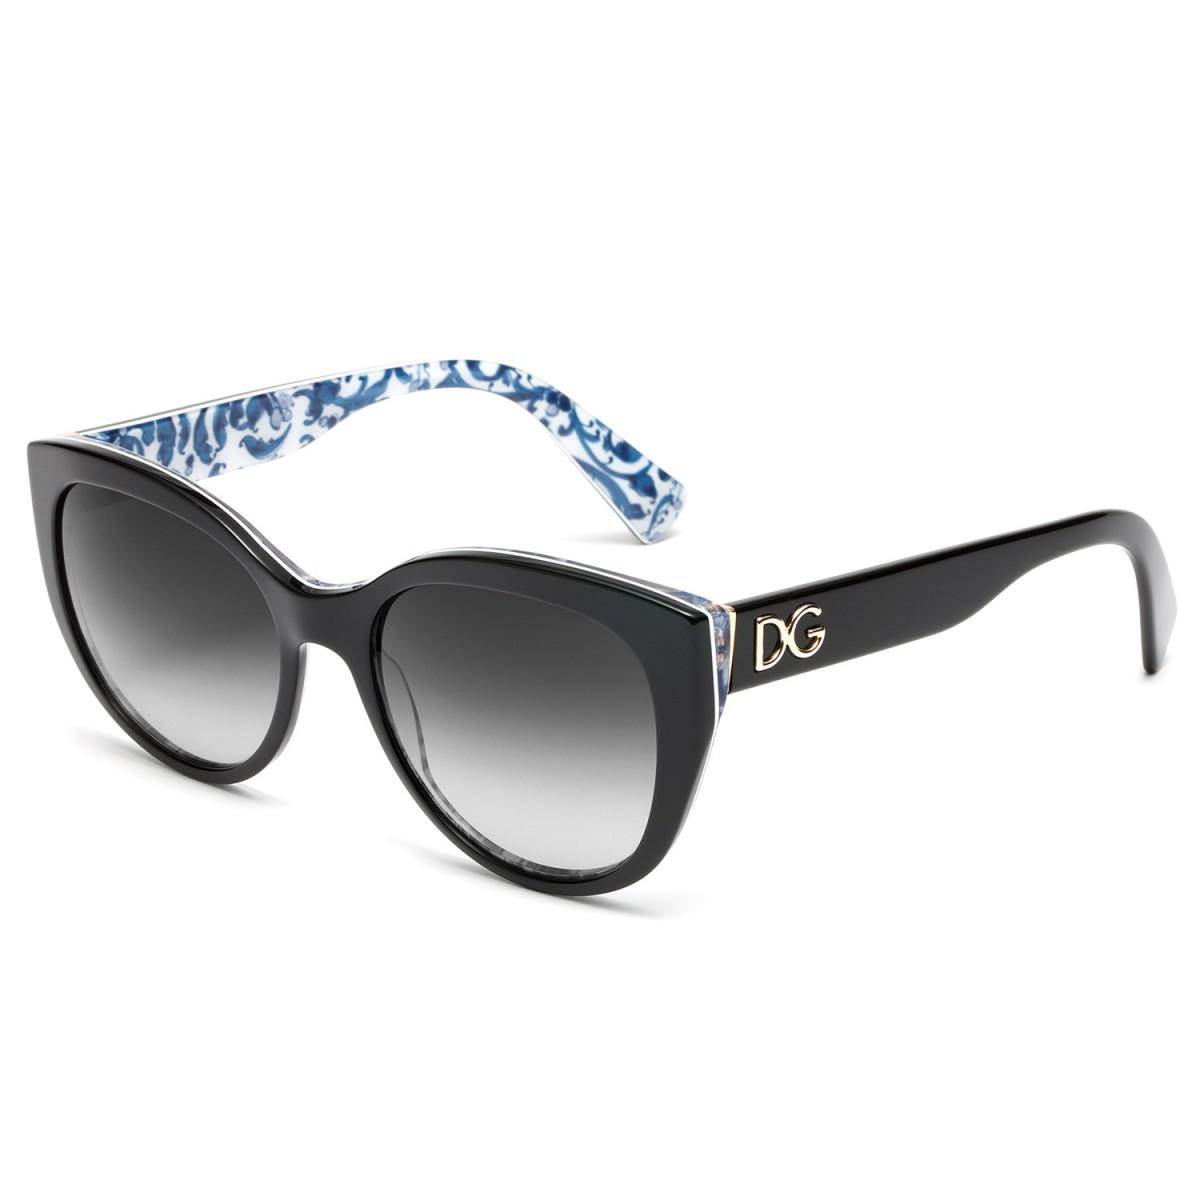 cc3d45d16c463 Compre Óculos de Sol Dolce Gabbana em 10X   Tri-Jóia Shop